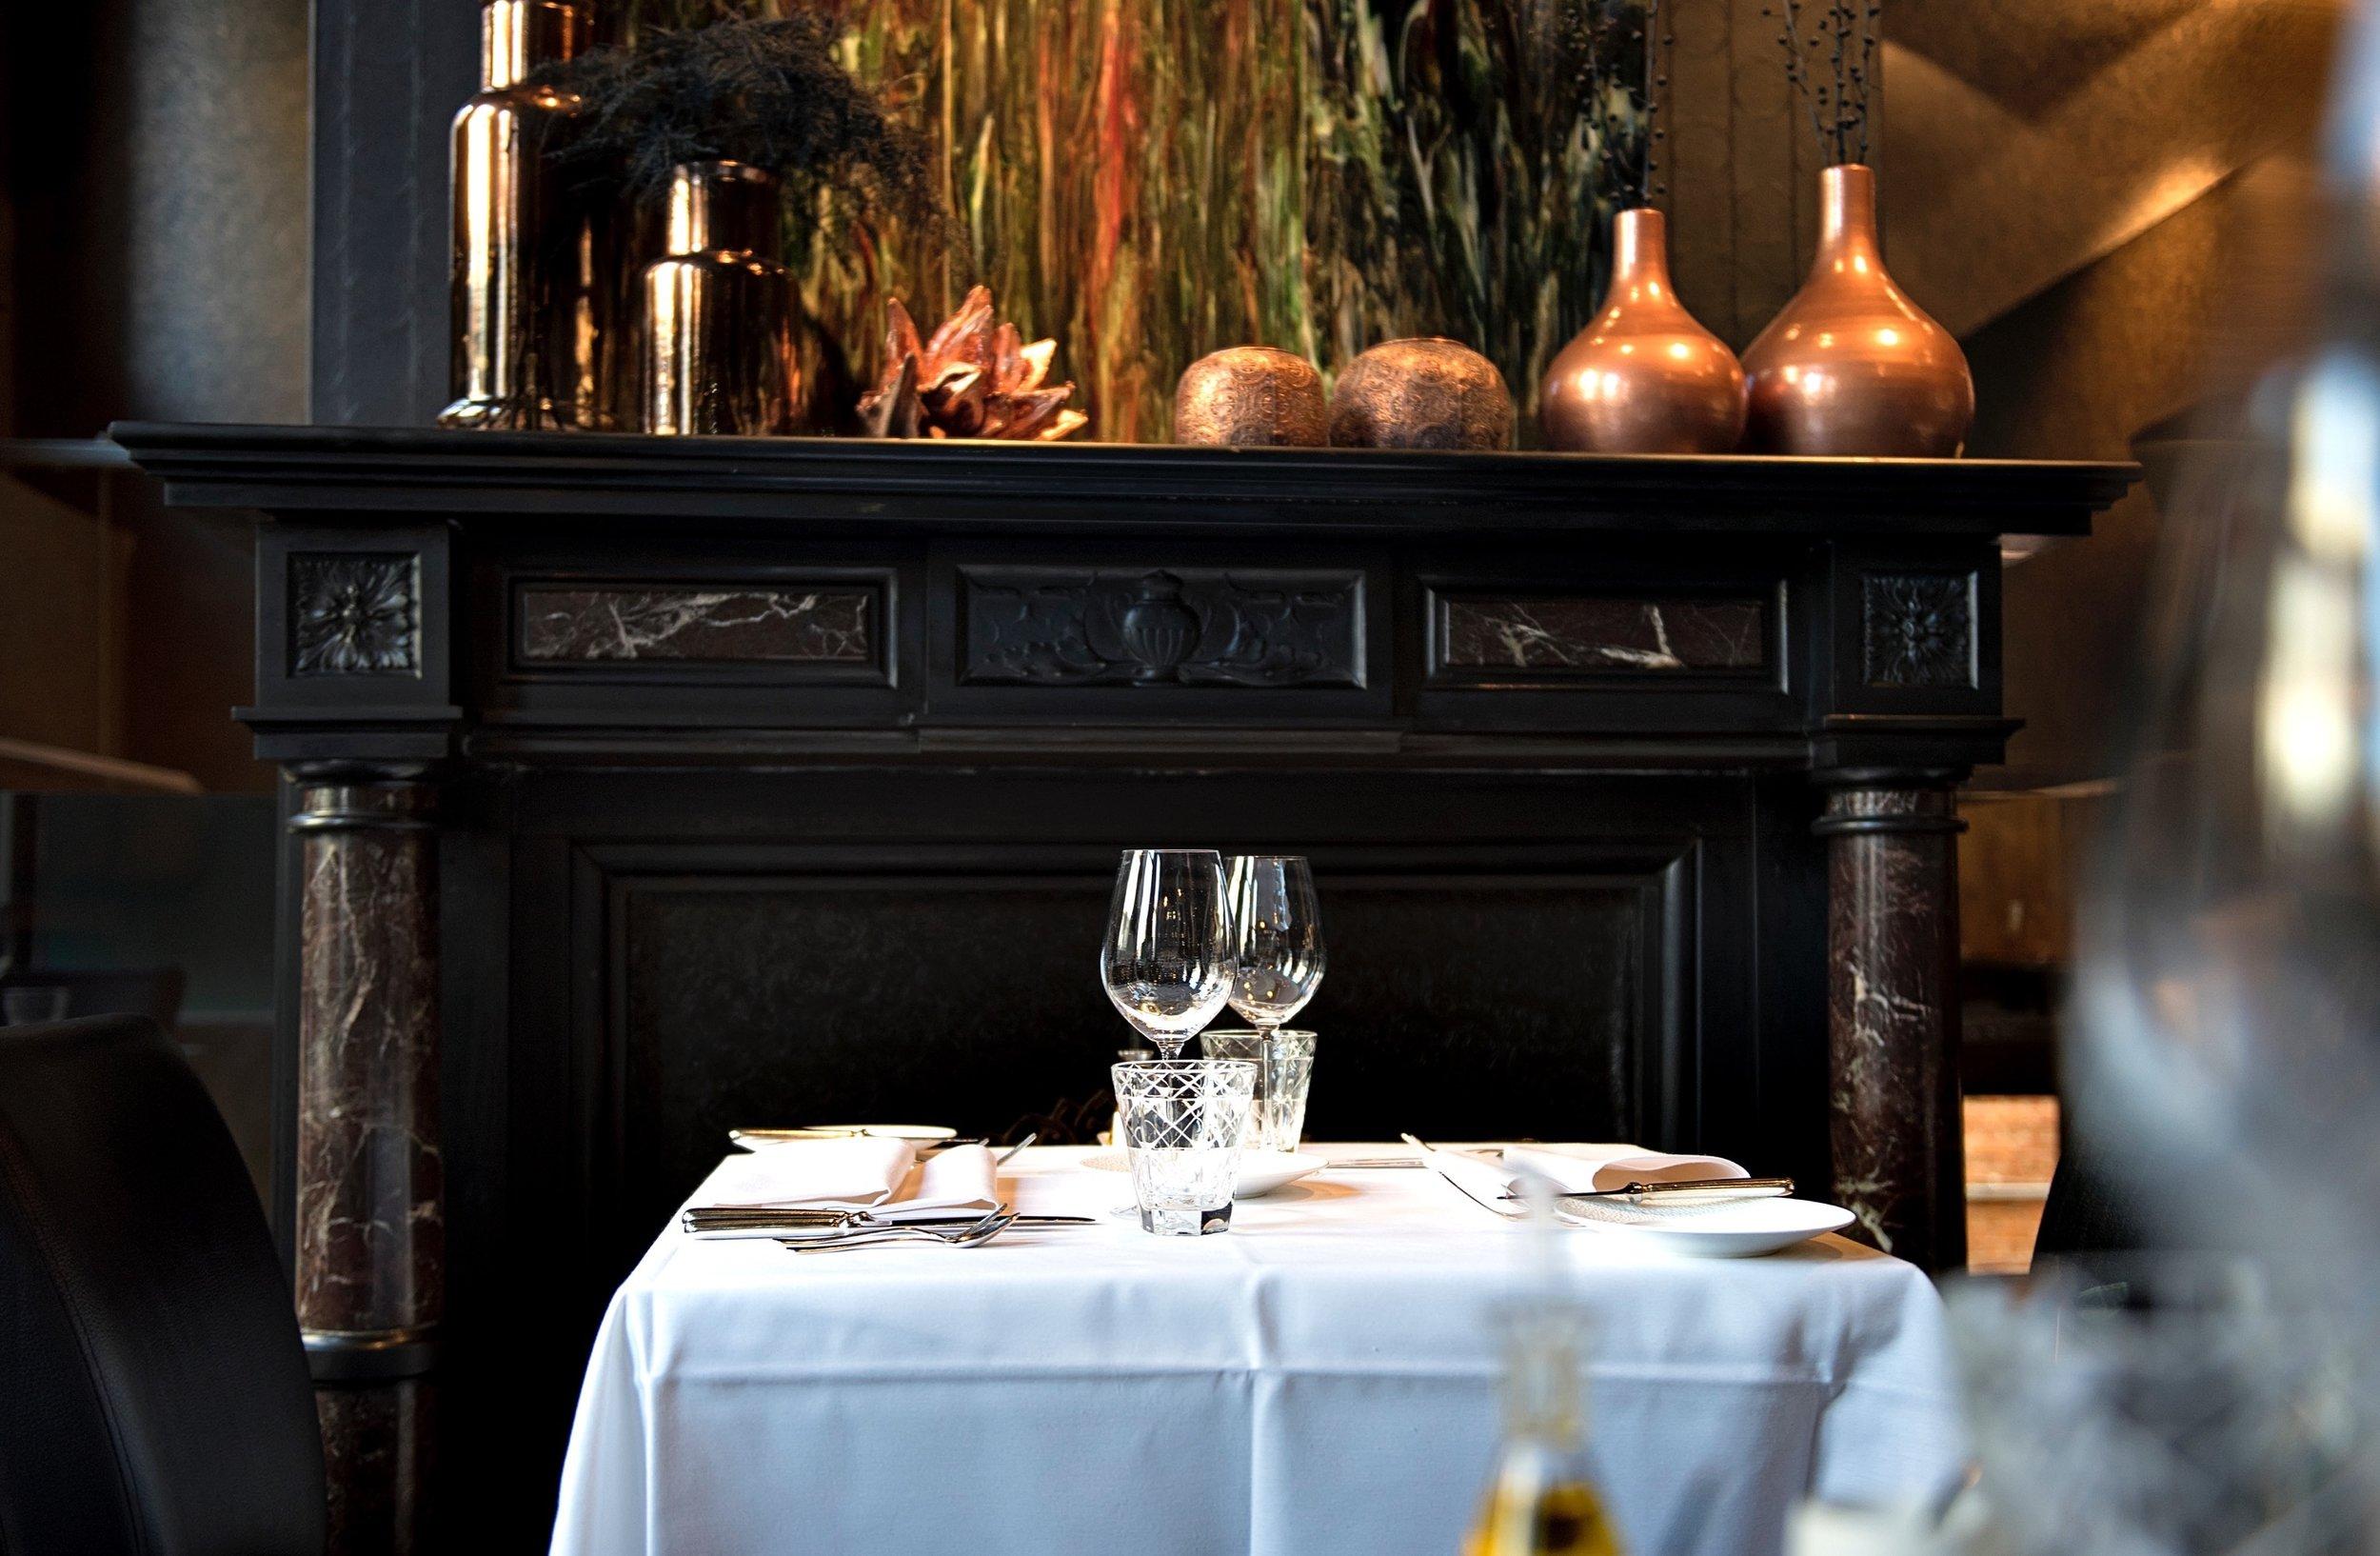 5 michelin restaurant the glorious antwerpen tablefever bart albrecht.jpg